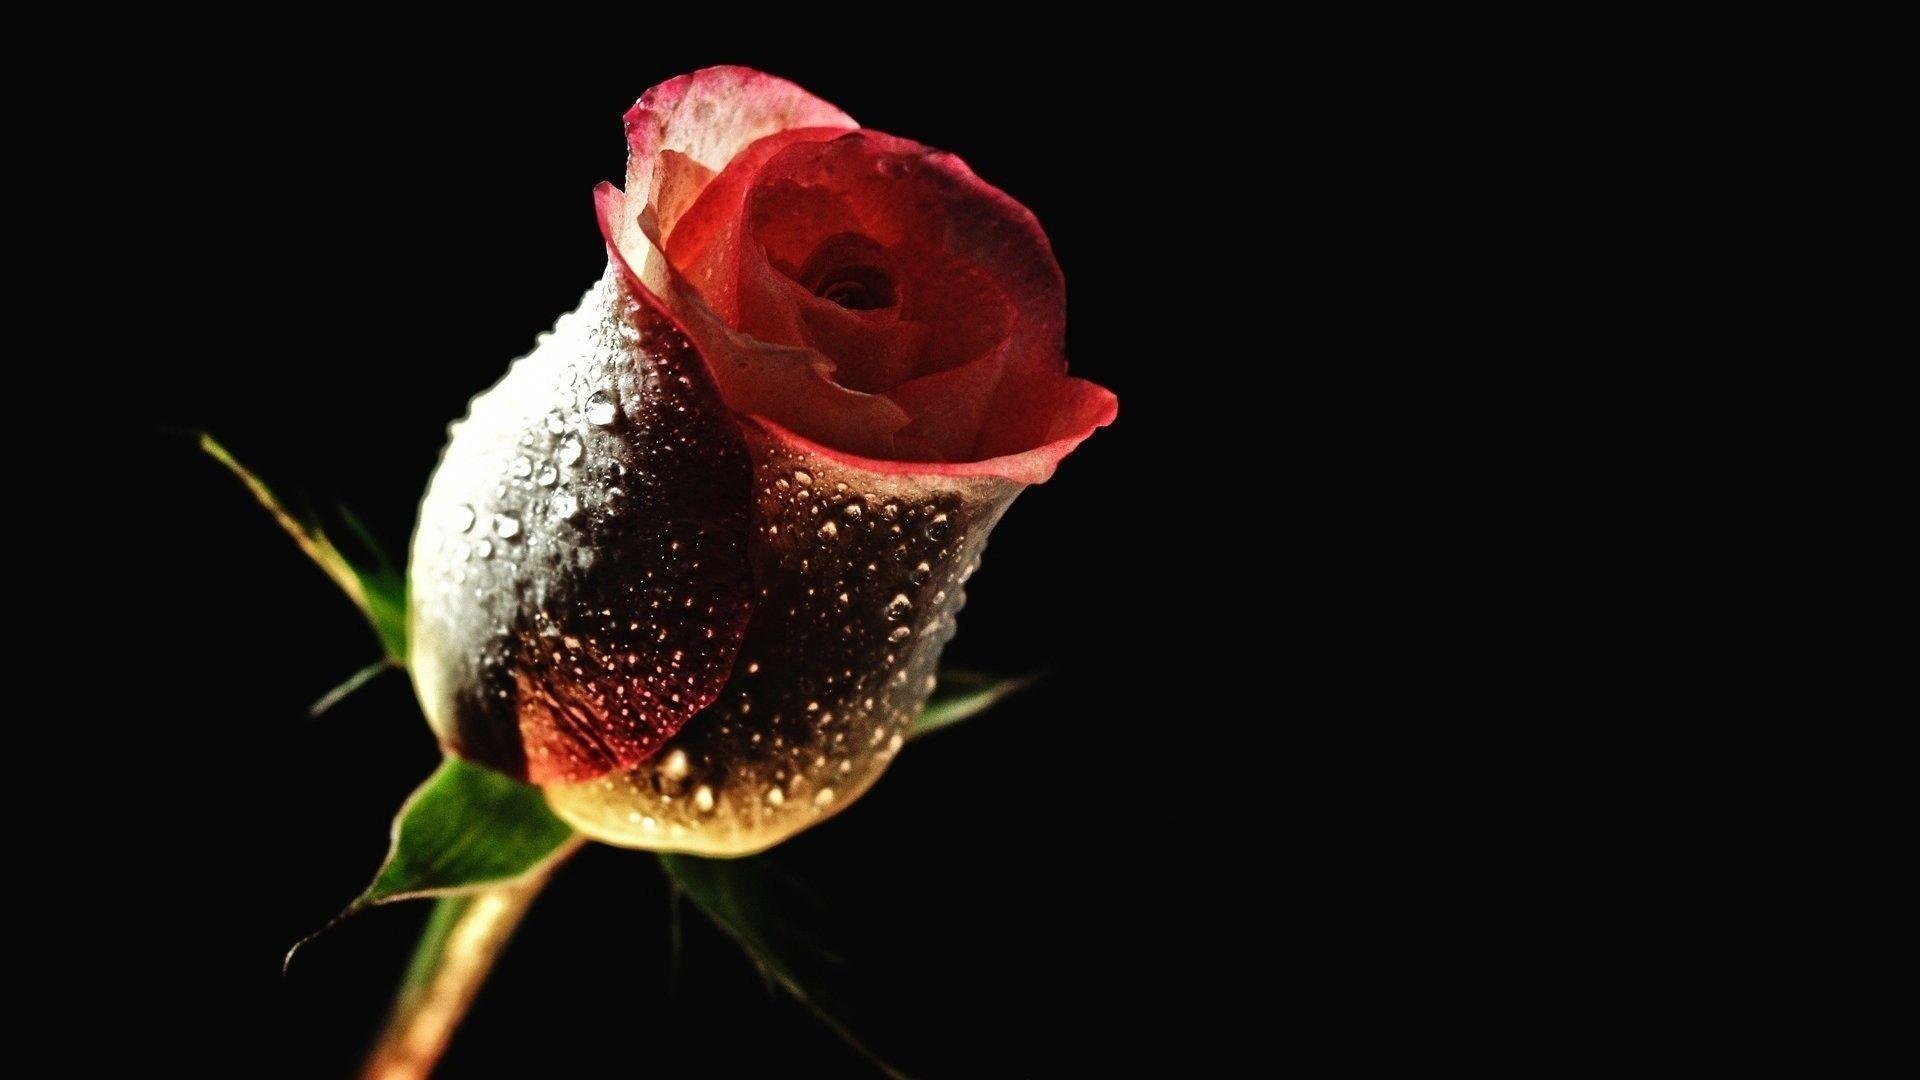 Rose Flower Hd Wallpapers Wallpaper Cave